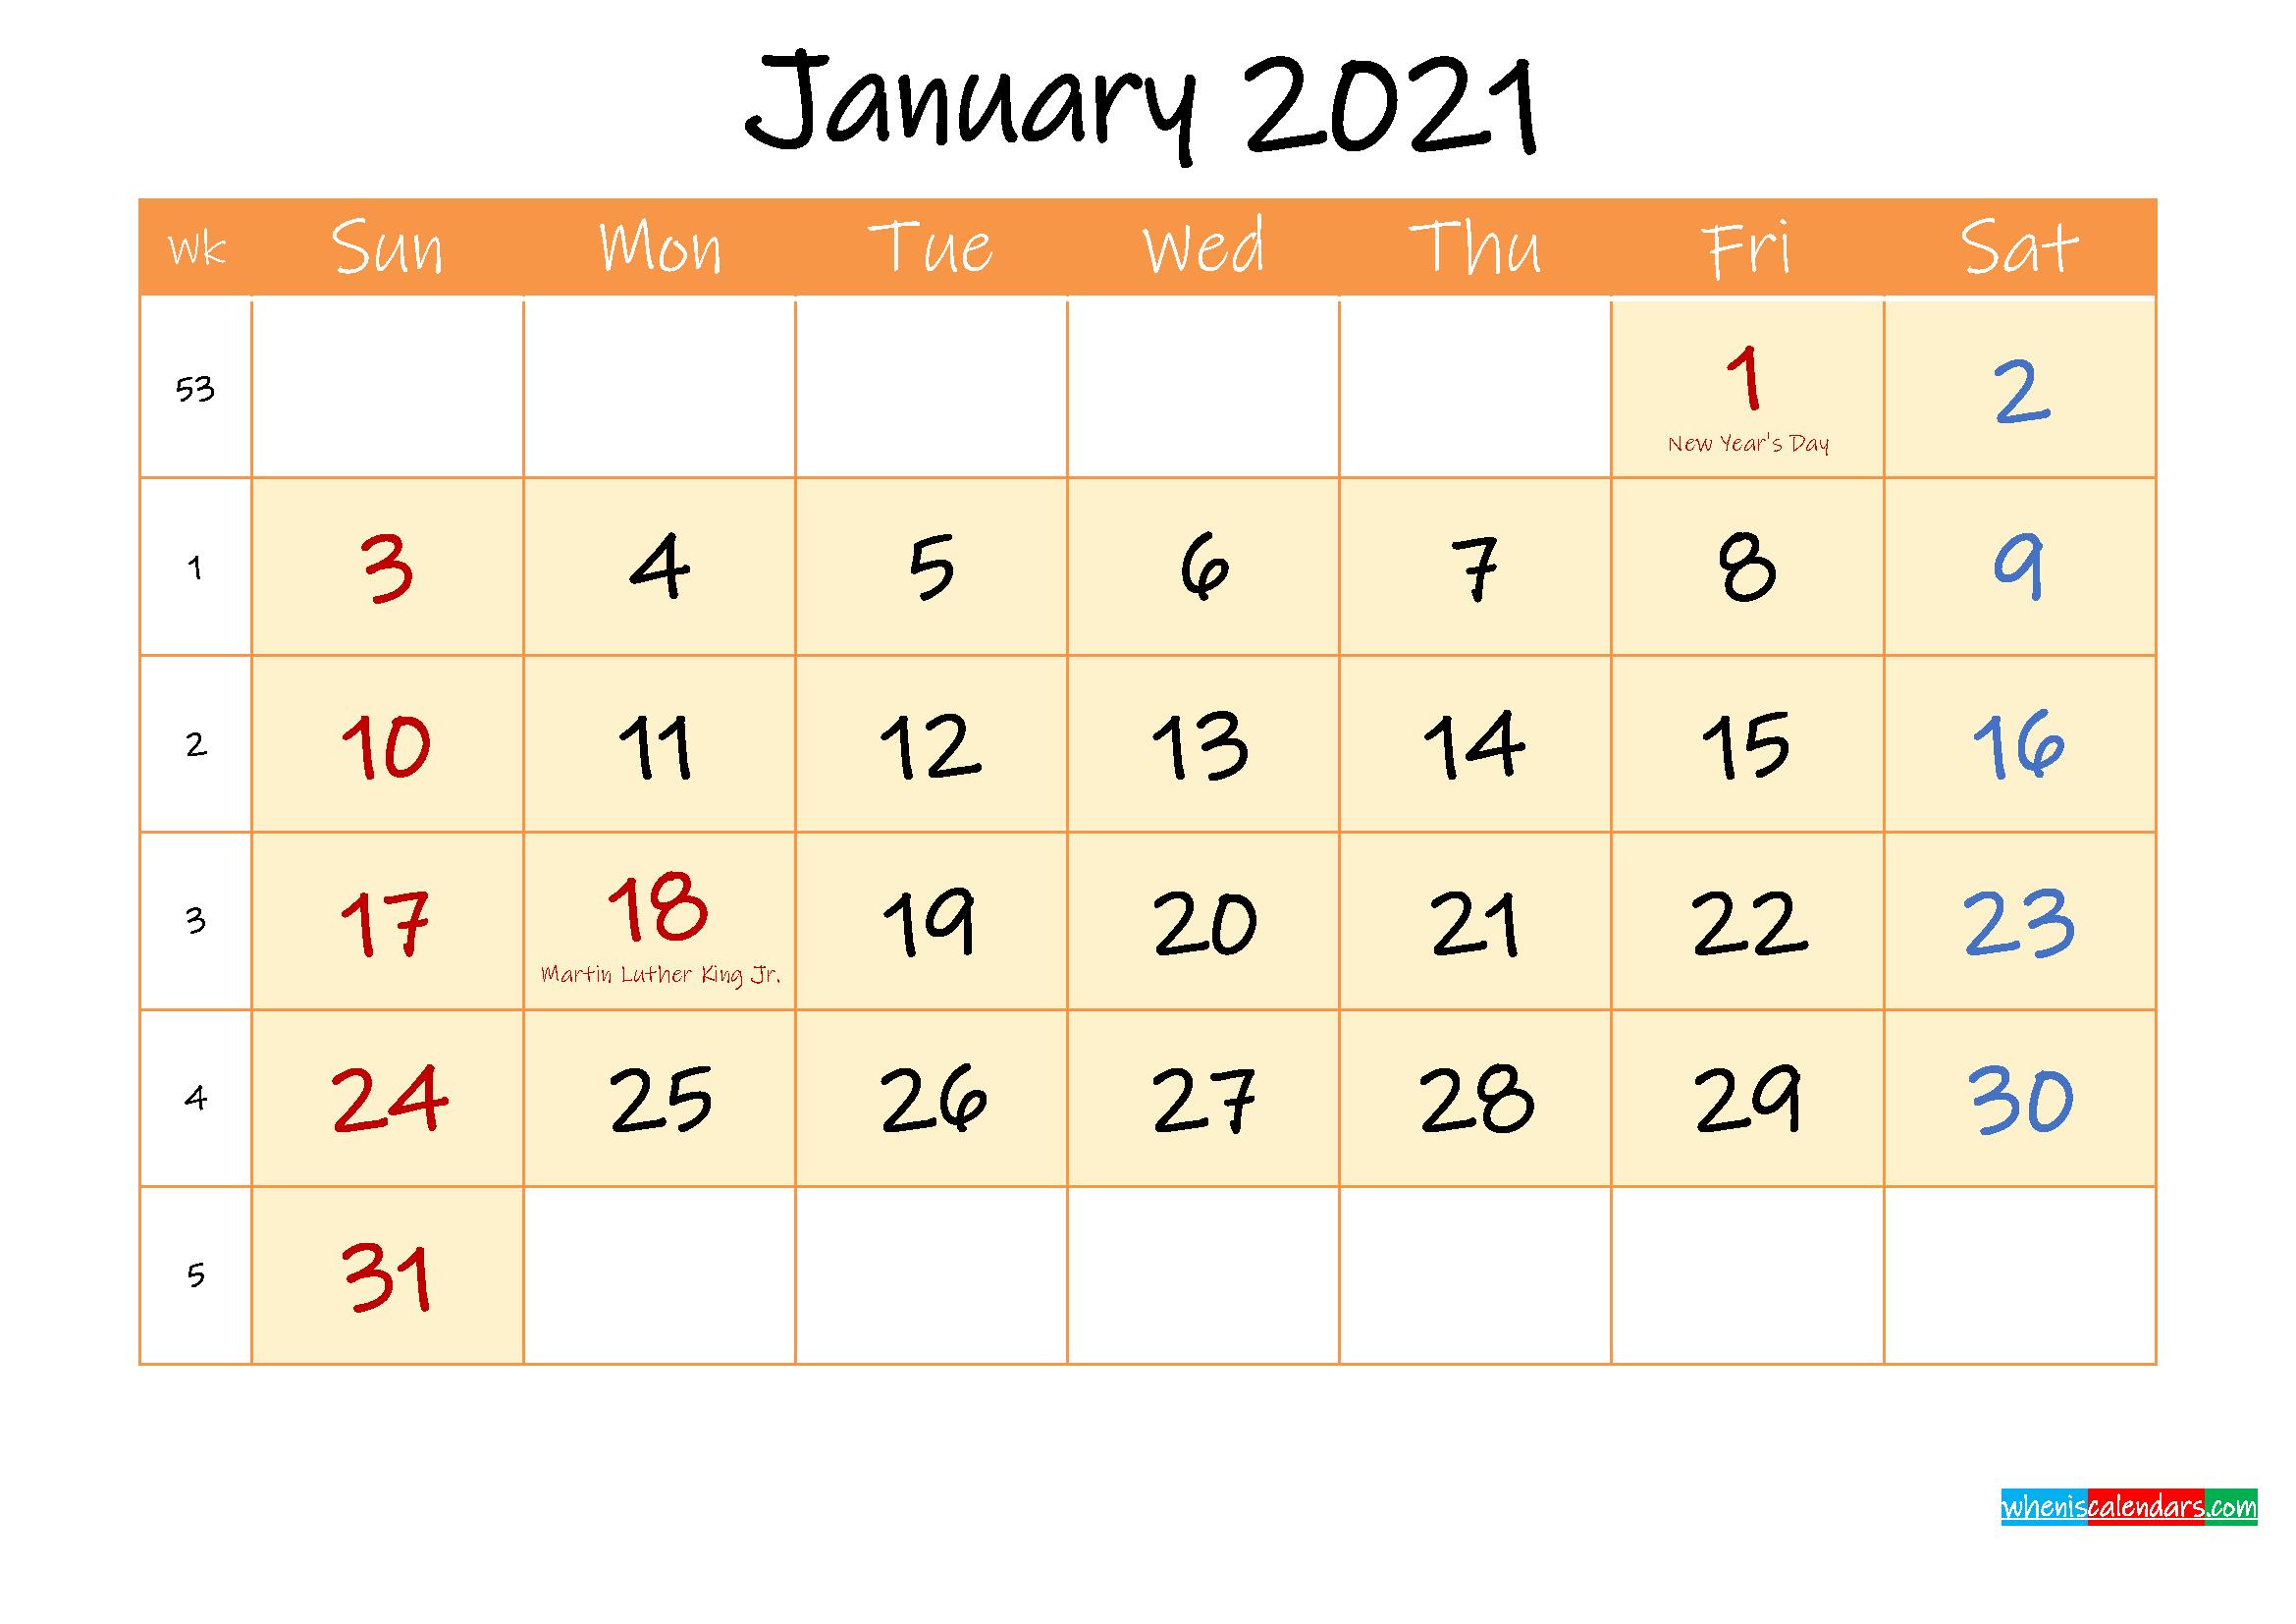 January 2021 Free Printable Calendar